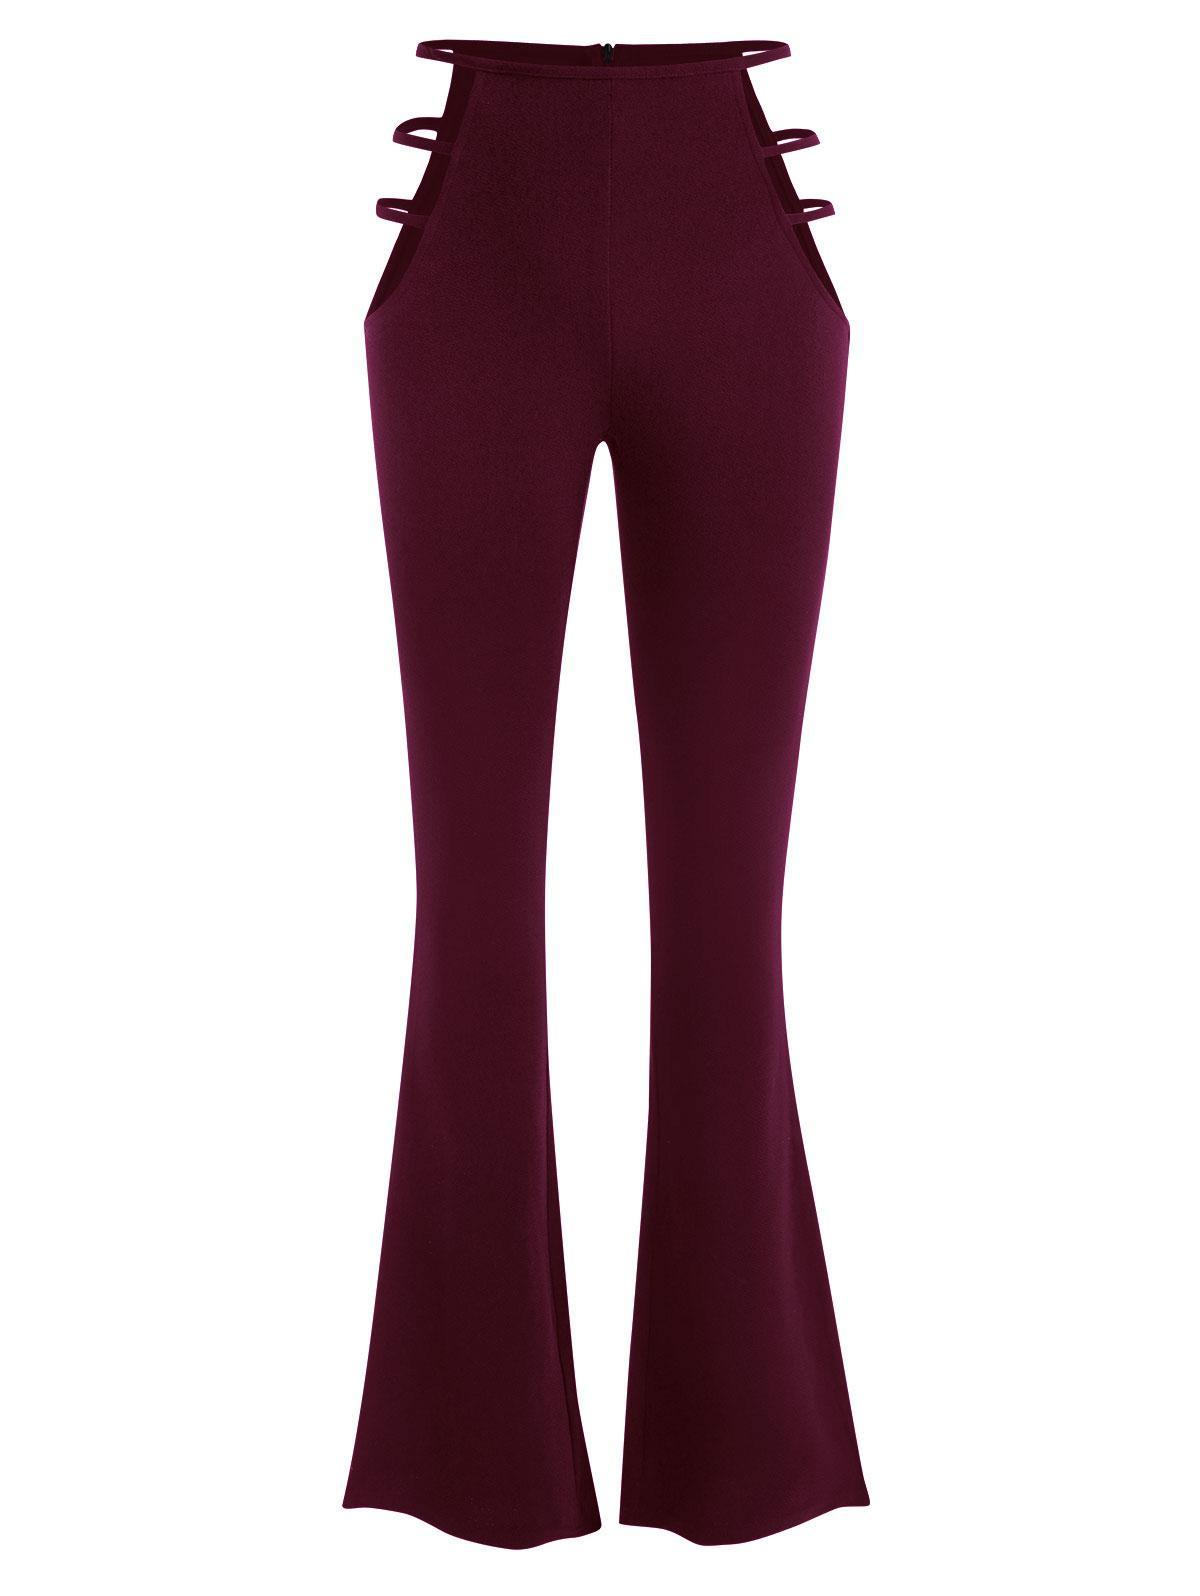 PantalonBootcutDécoupé Texturé à Taille Haute S - Zaful FR - Modalova